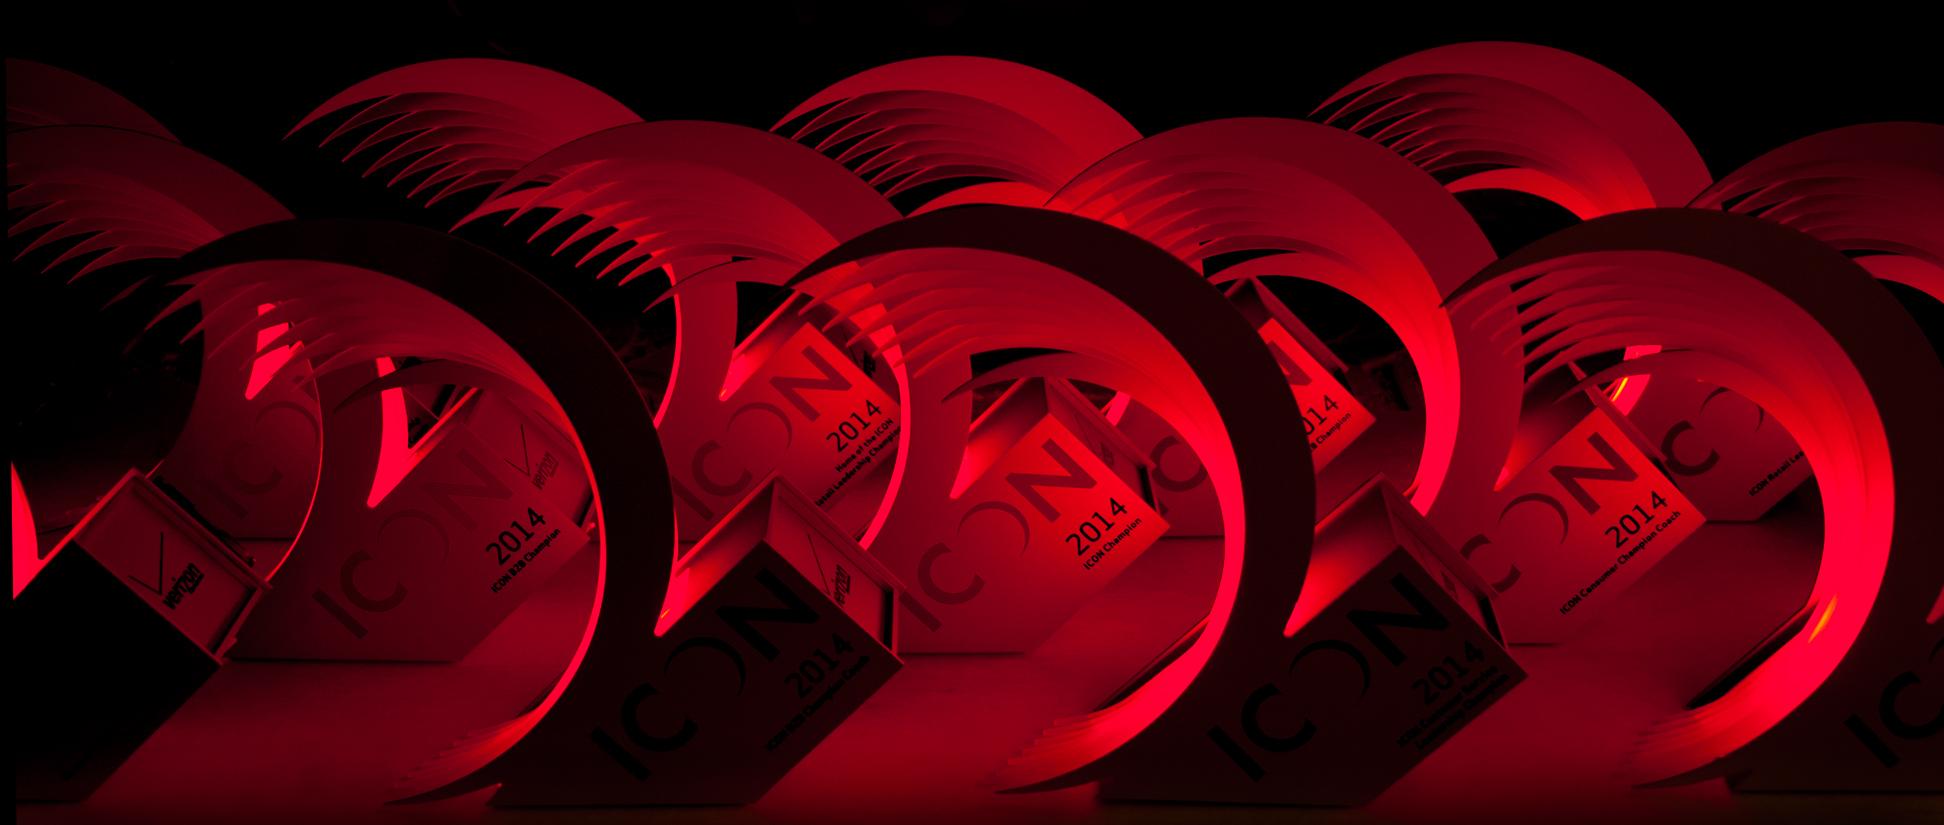 verizon custom awards trophies LEDs glowing